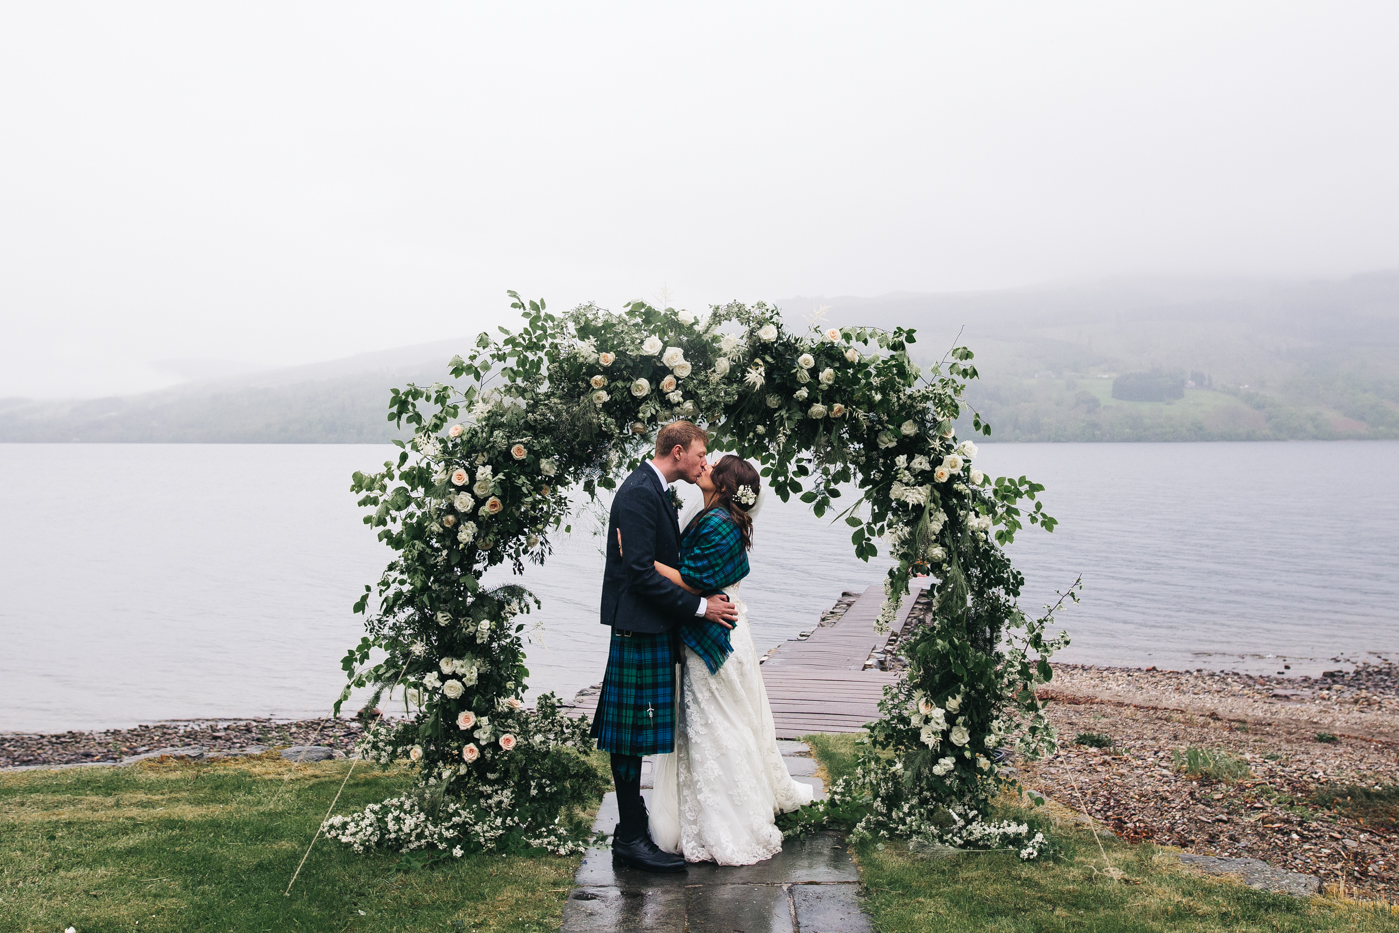 scottish-wedding-trossachs-loch-tay-highlannds-relaxed-photography-photographer-0041.jpg